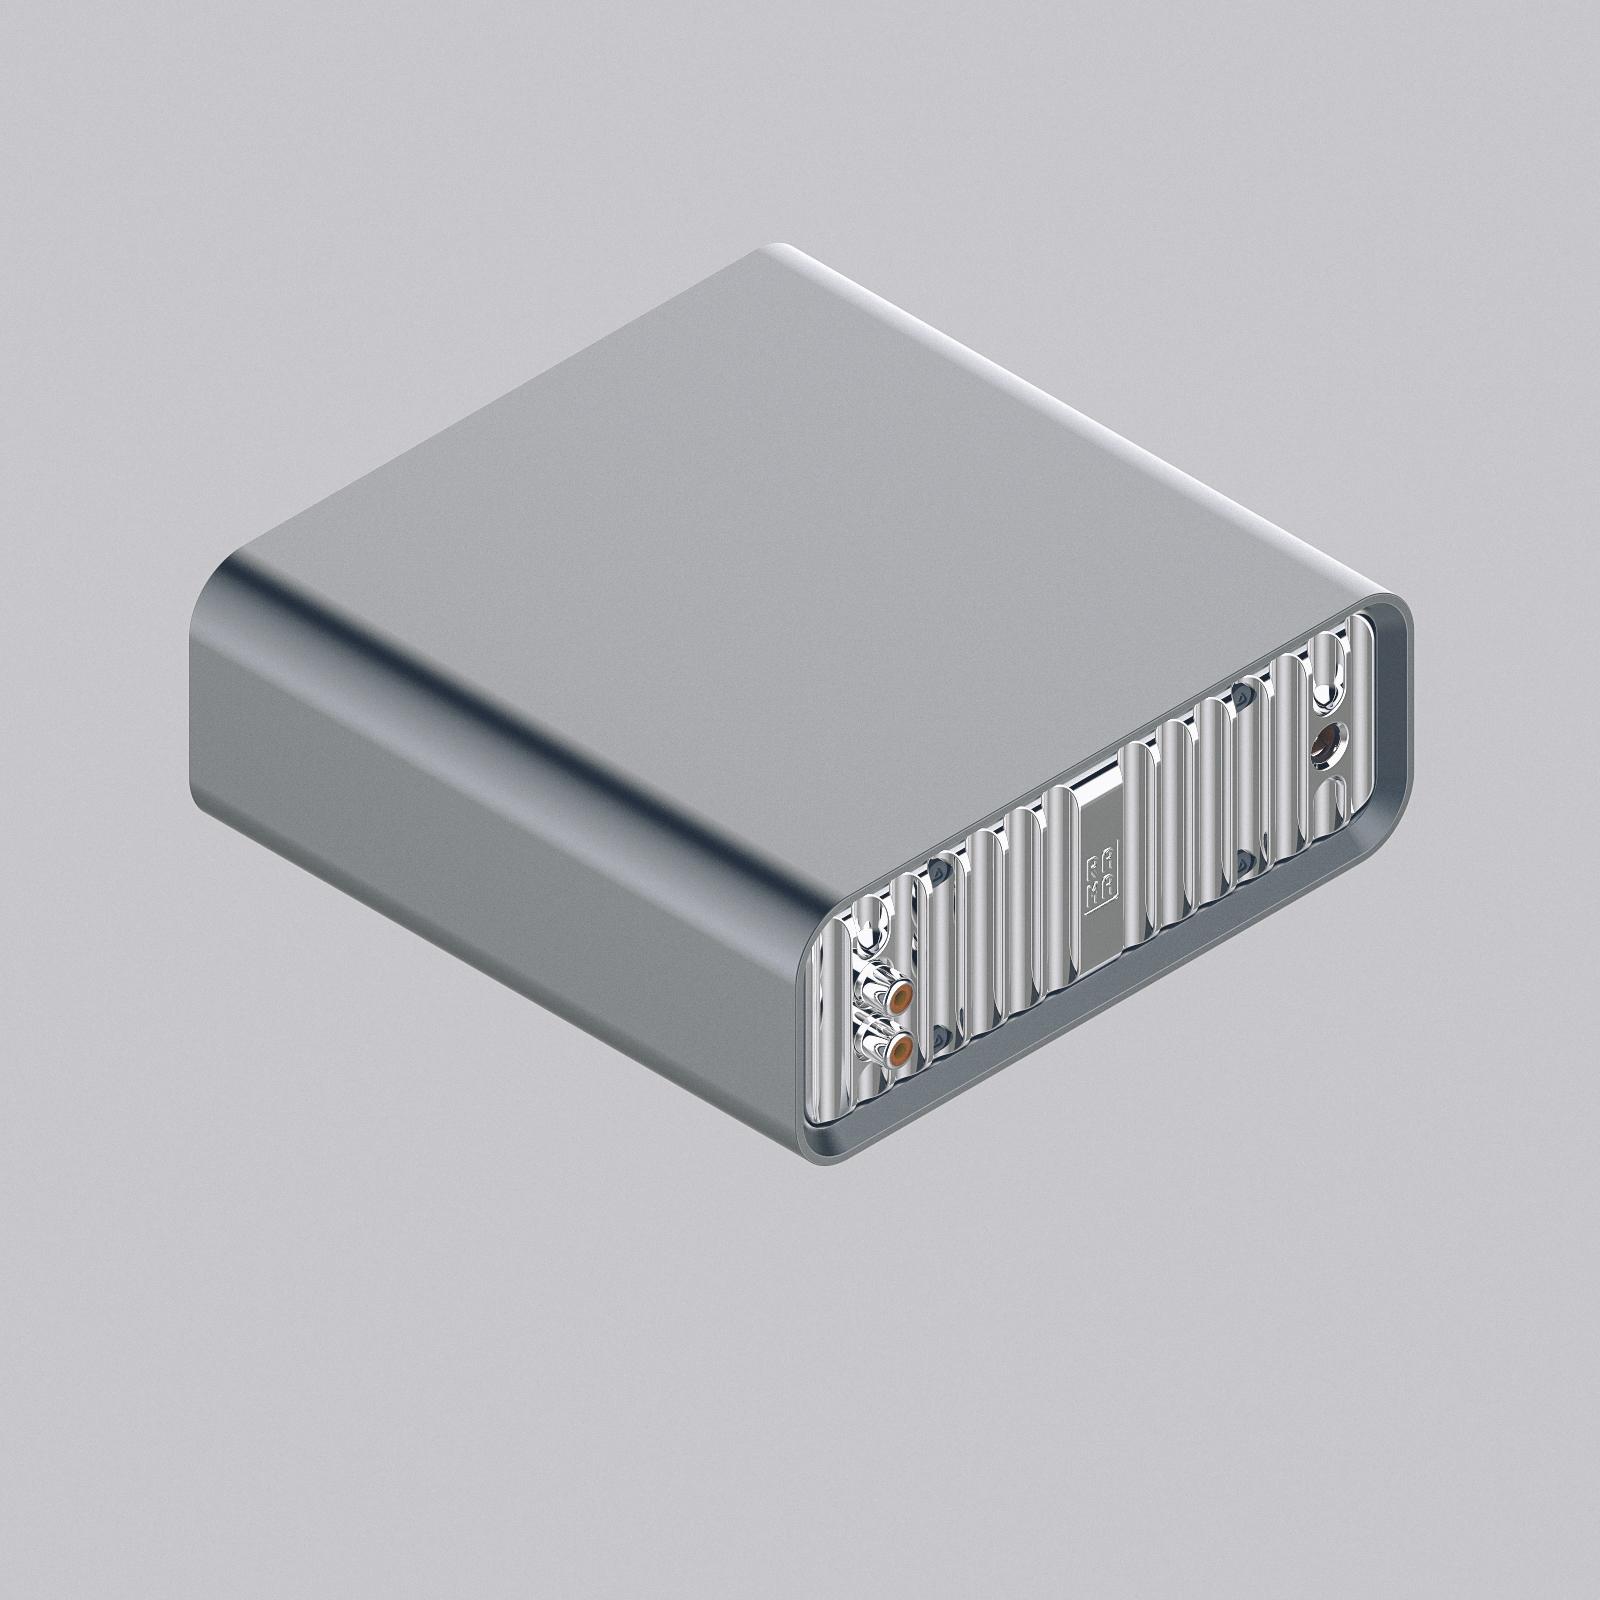 RAMA-PHOTO-EDIT-rama-audio-01.1147370.jpg